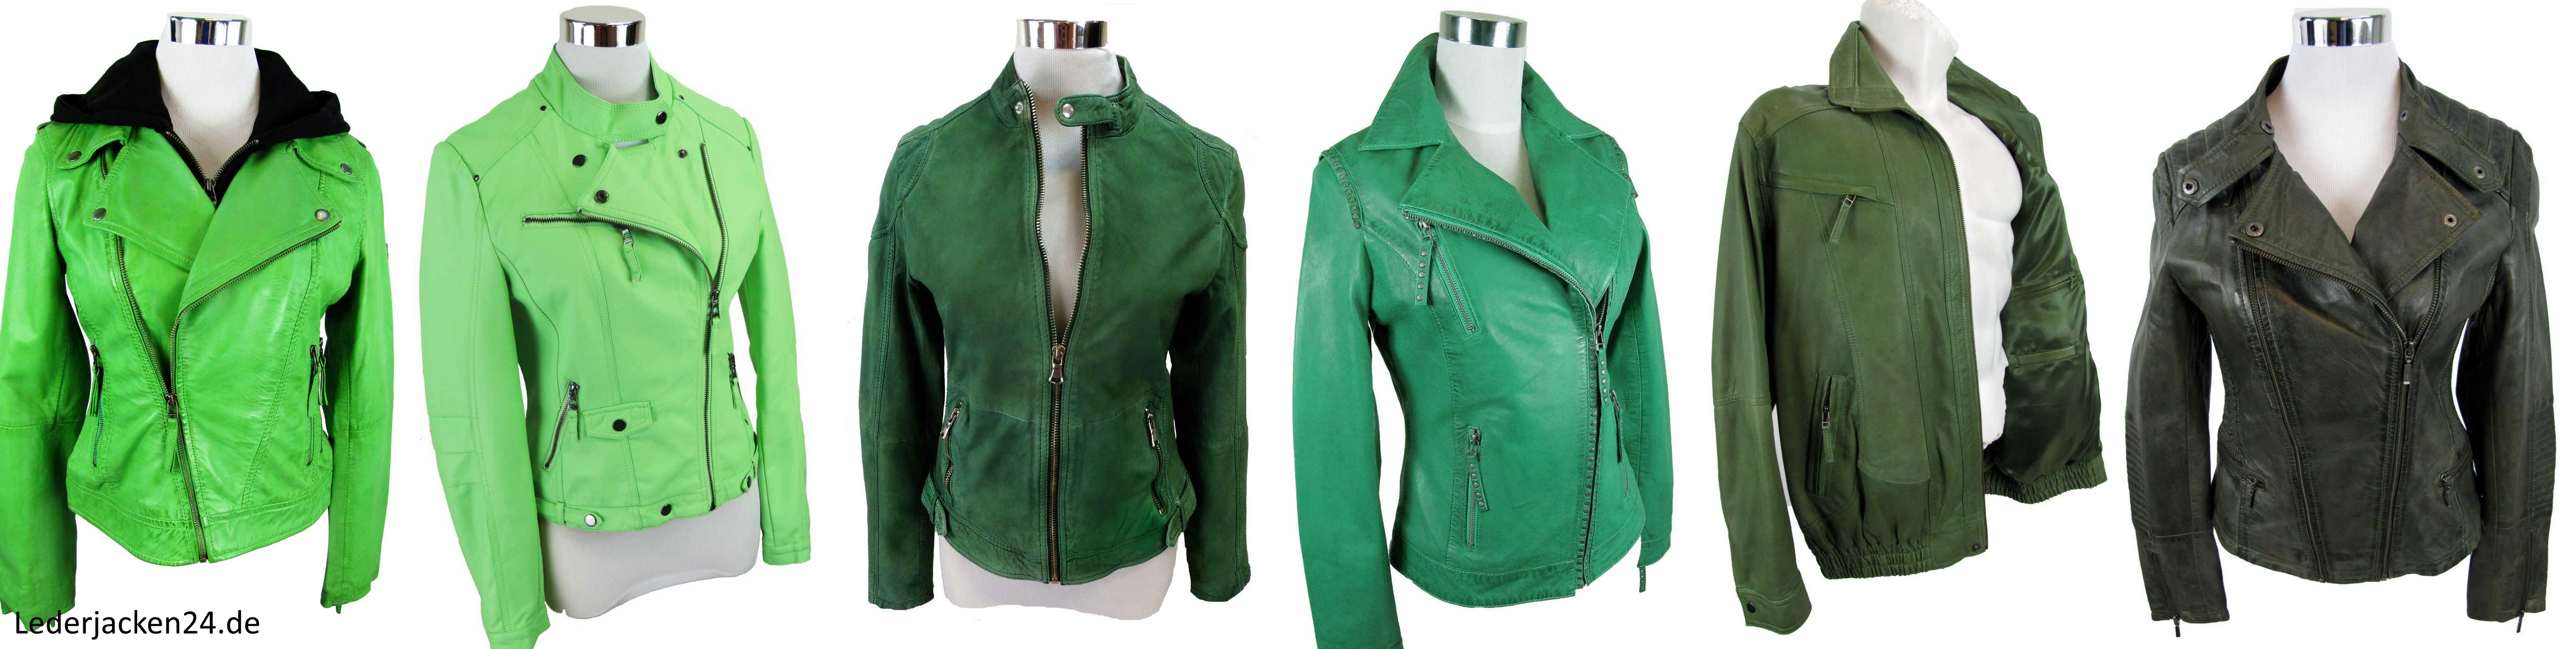 grüne Lederjacken auf shop.lederjacken24.de